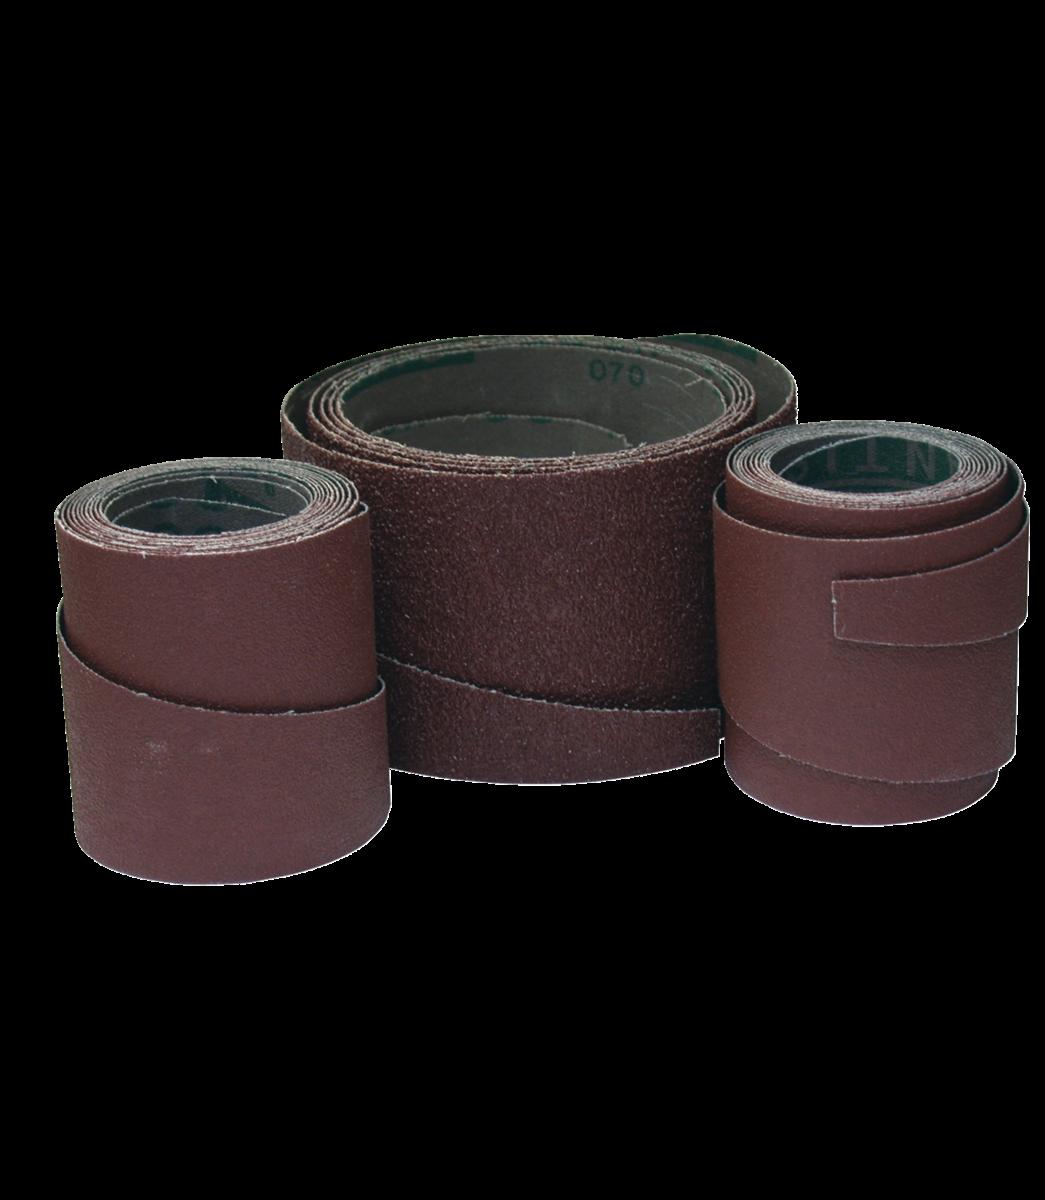 "25"" Sandpaper 220 Grit Fits JWDS-2550, 3-Wraps in Box"